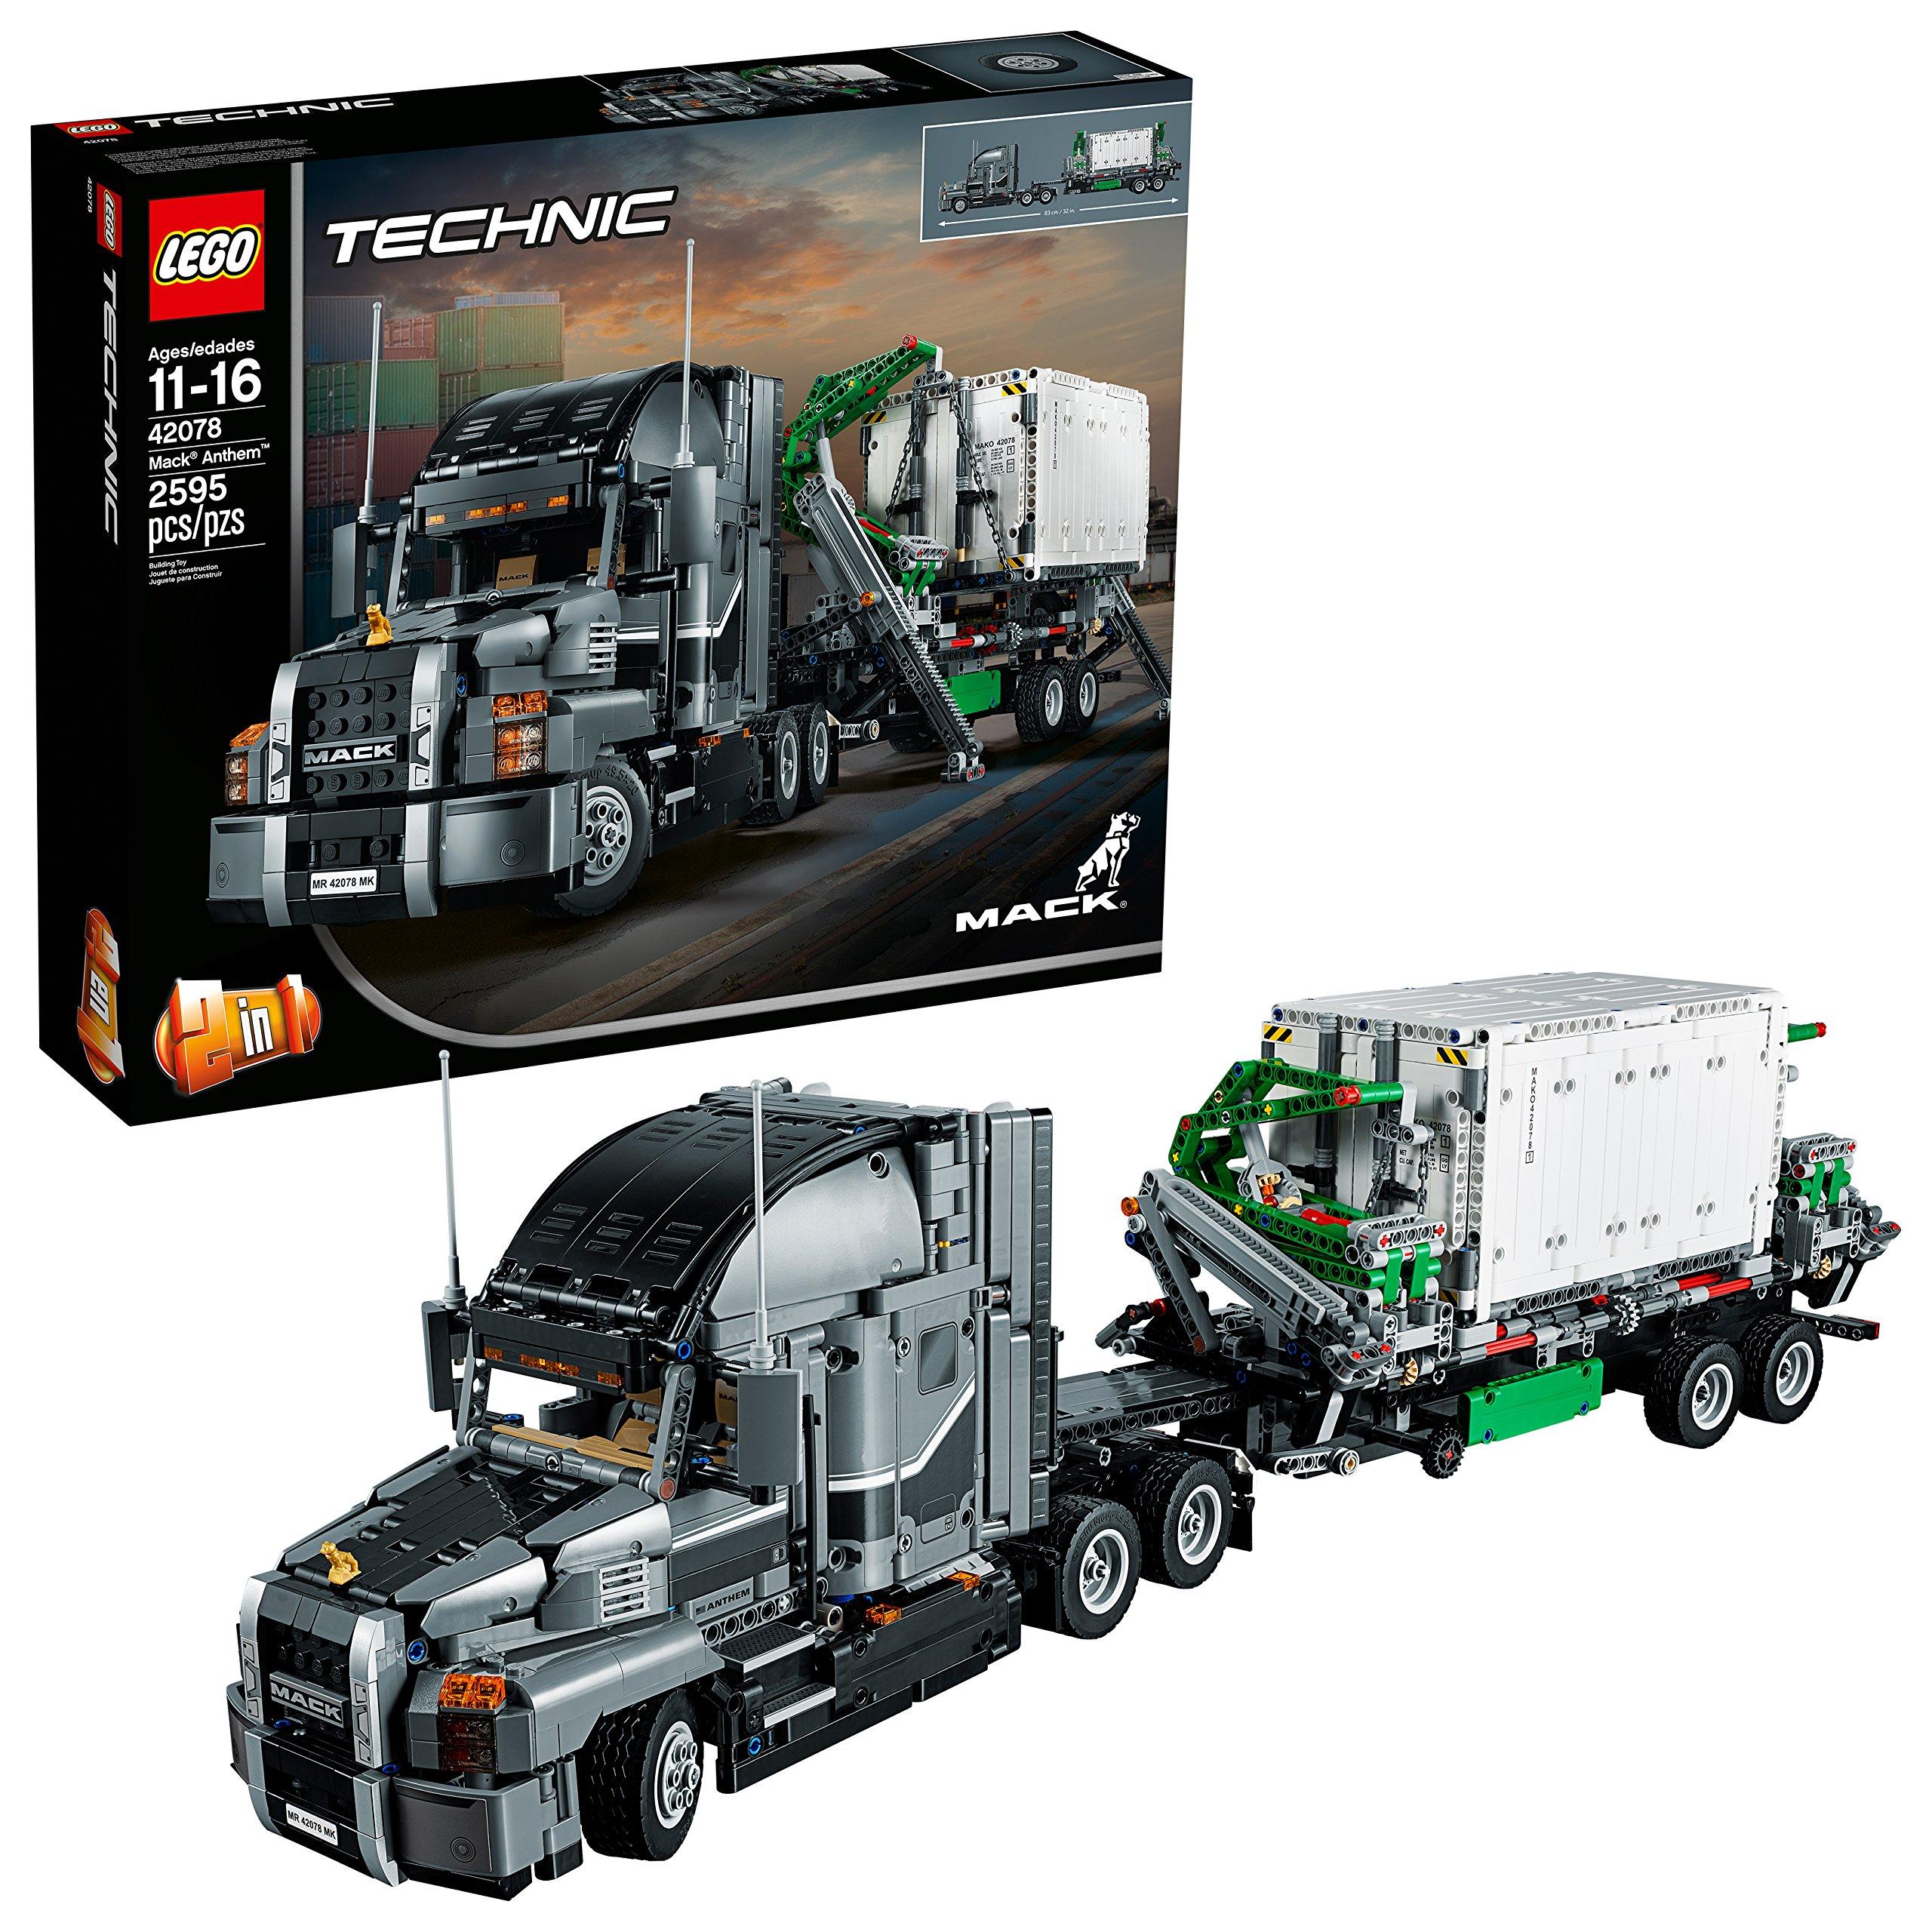 LEGO Technic Mack Anthem 42078 Building Kit (2595 Piece)